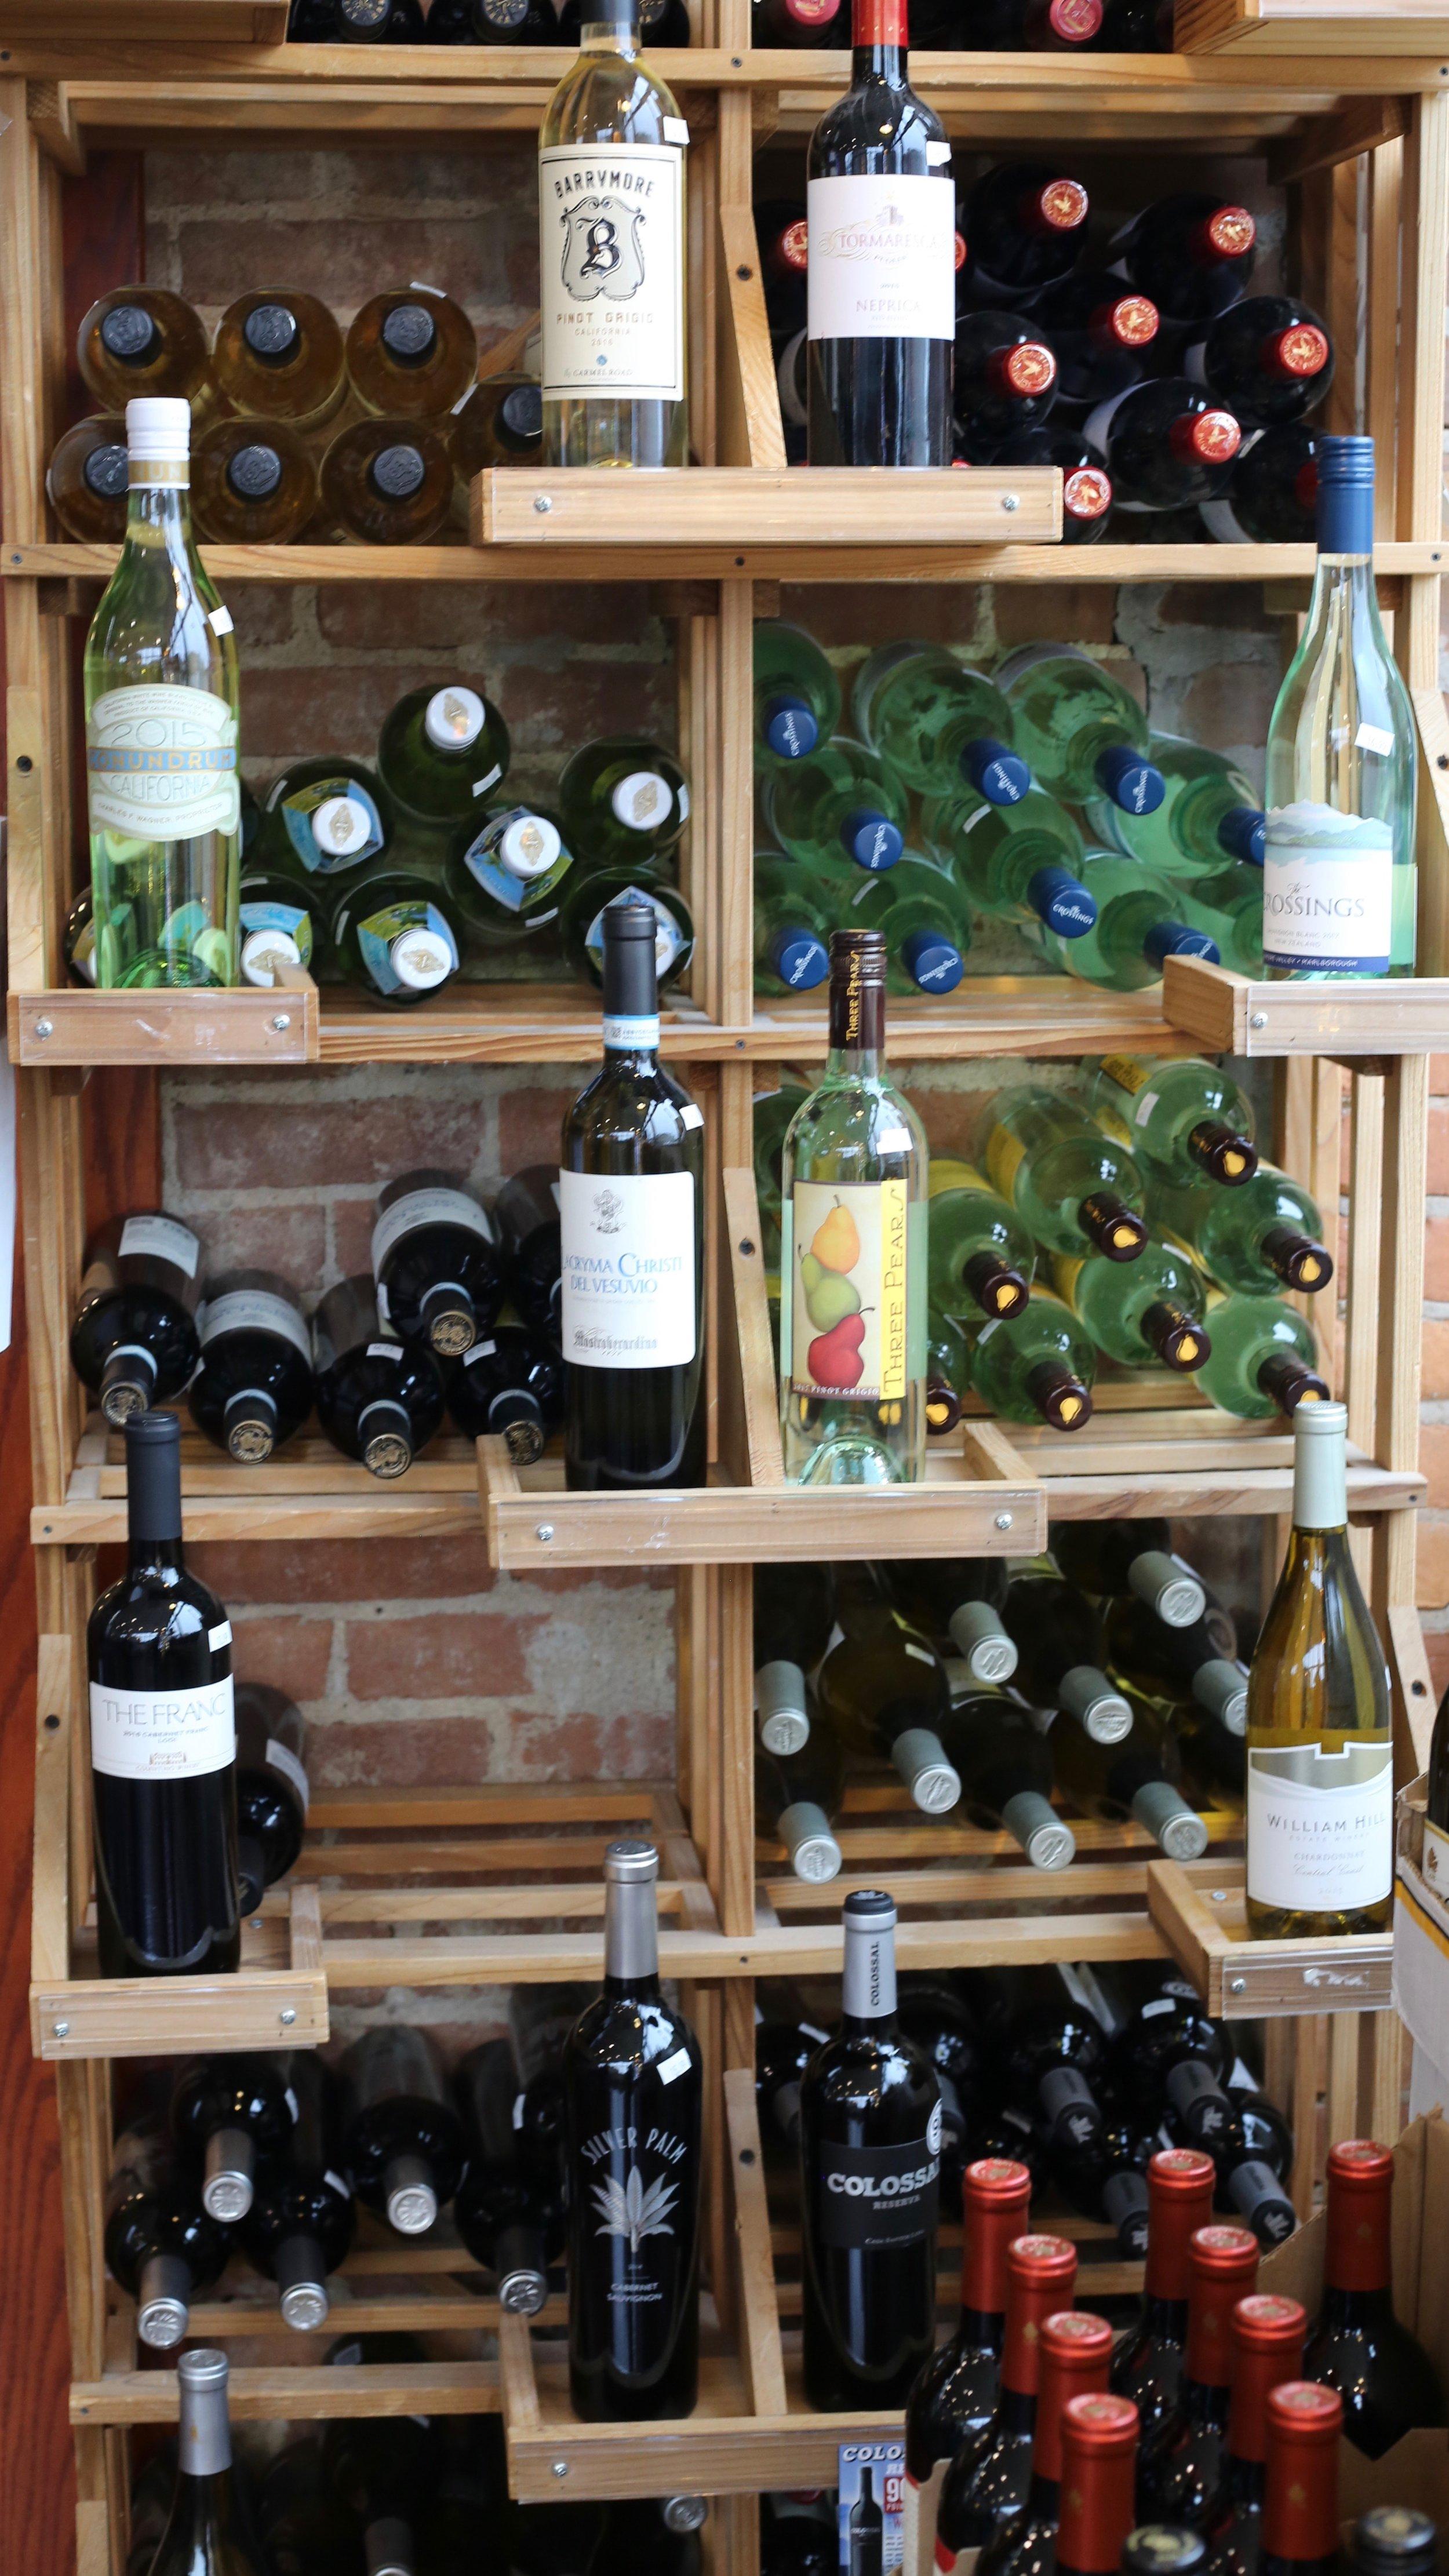 effingham-village-wine-and-spirits-29.jpeg